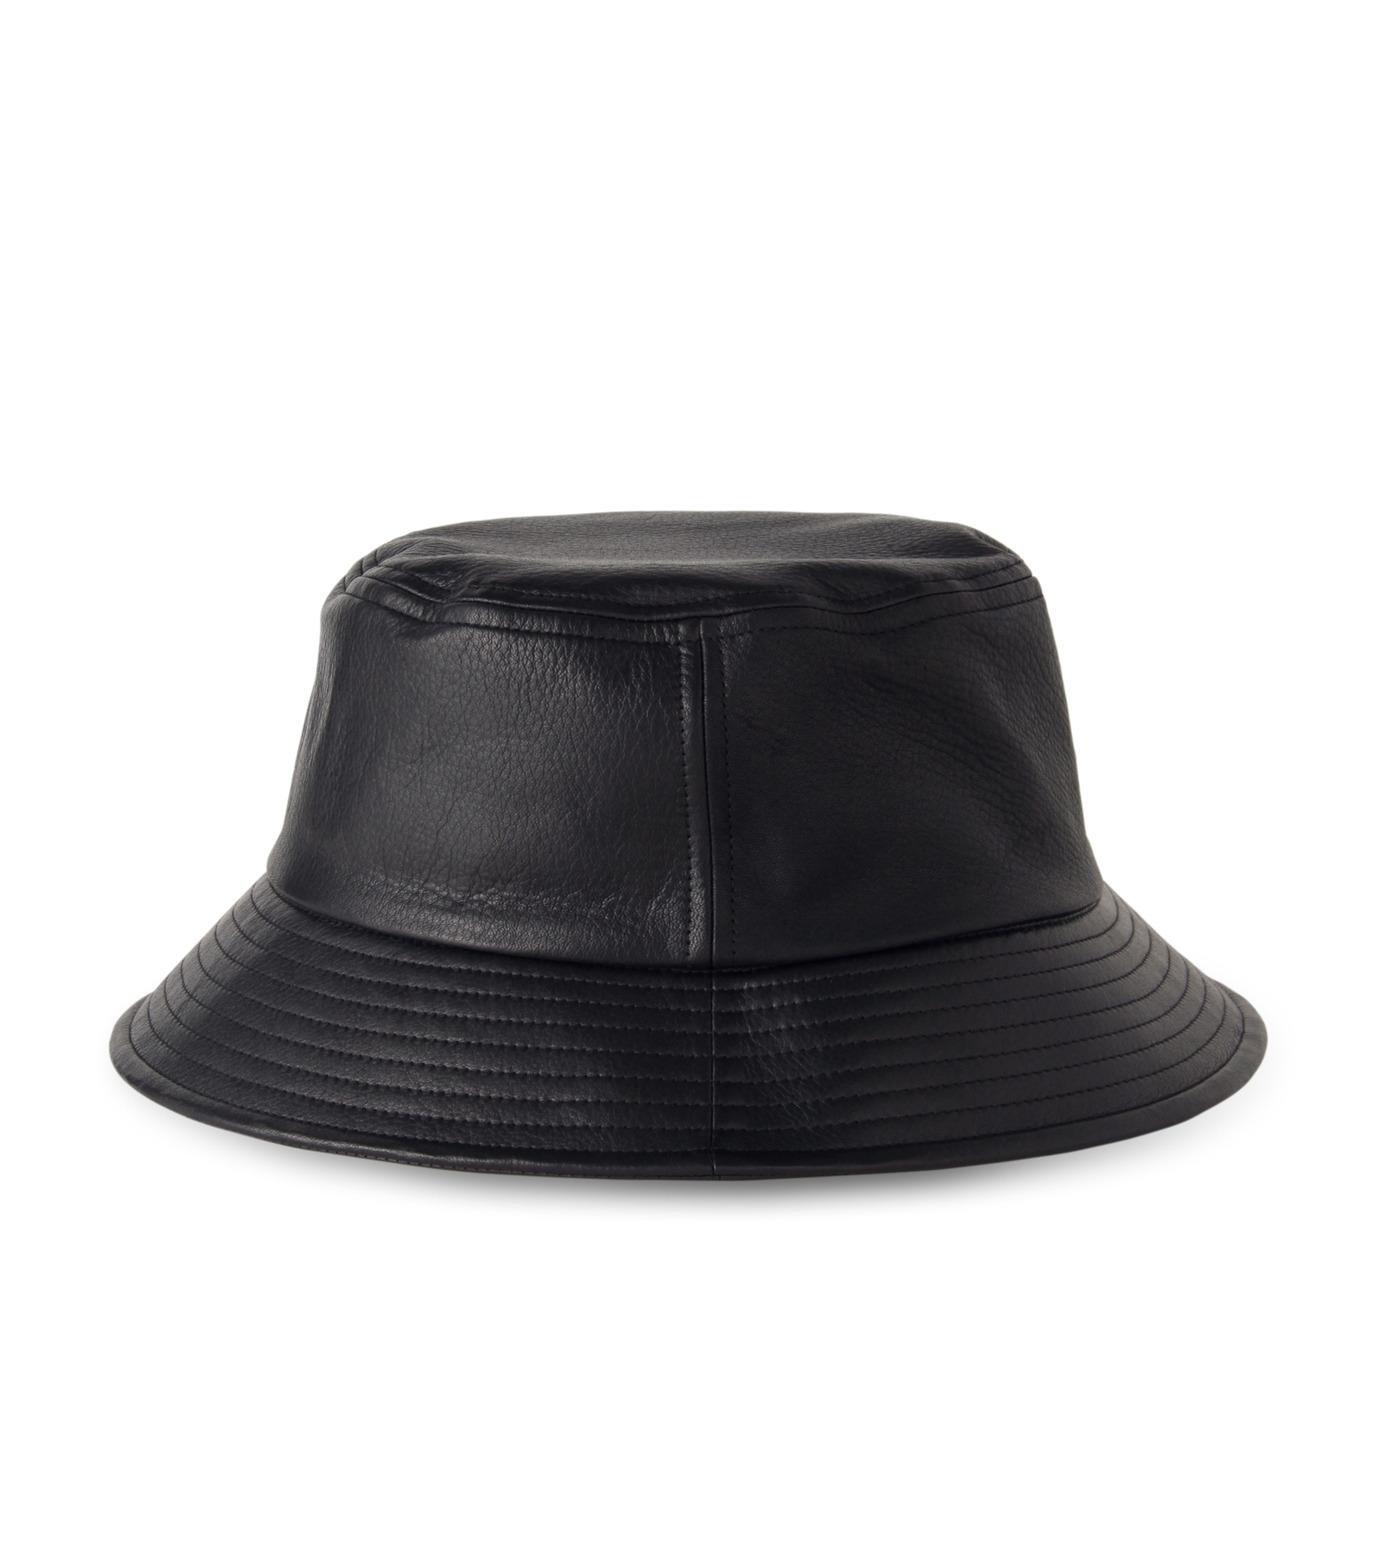 HL HEDDIE LOVU(エイチエル・エディールーヴ)のHL LEATHER BACKE-BLACK(キャップ/cap)-17A90003-13 拡大詳細画像4